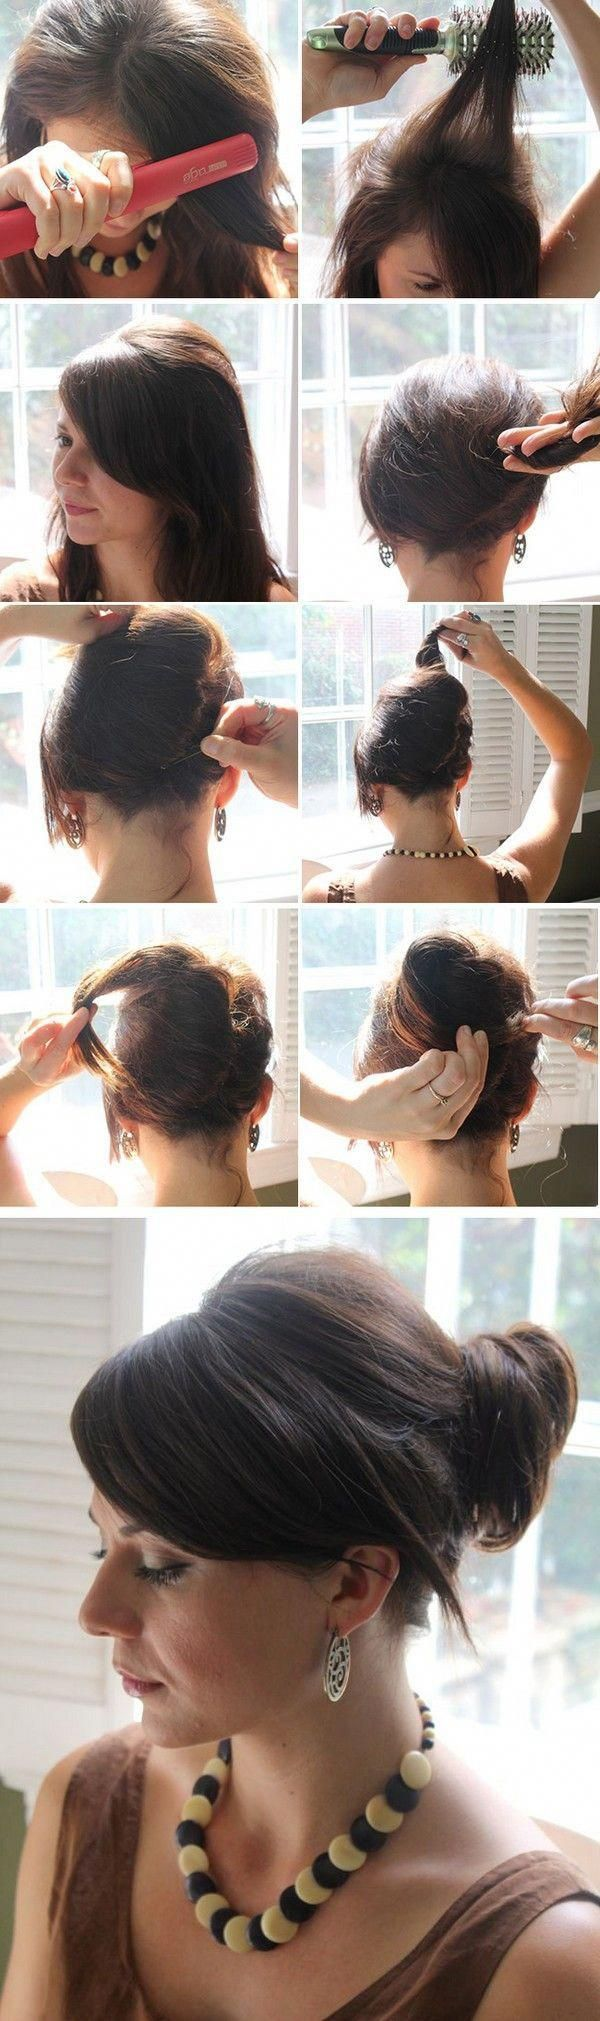 9 Splendid Simple Ideas: Bouffant Hairstyles Beehive everyday hairstyles lazy girl.Everyday Hairstyles Lazy Girl brunette hairstyles fashion.Messy Hai